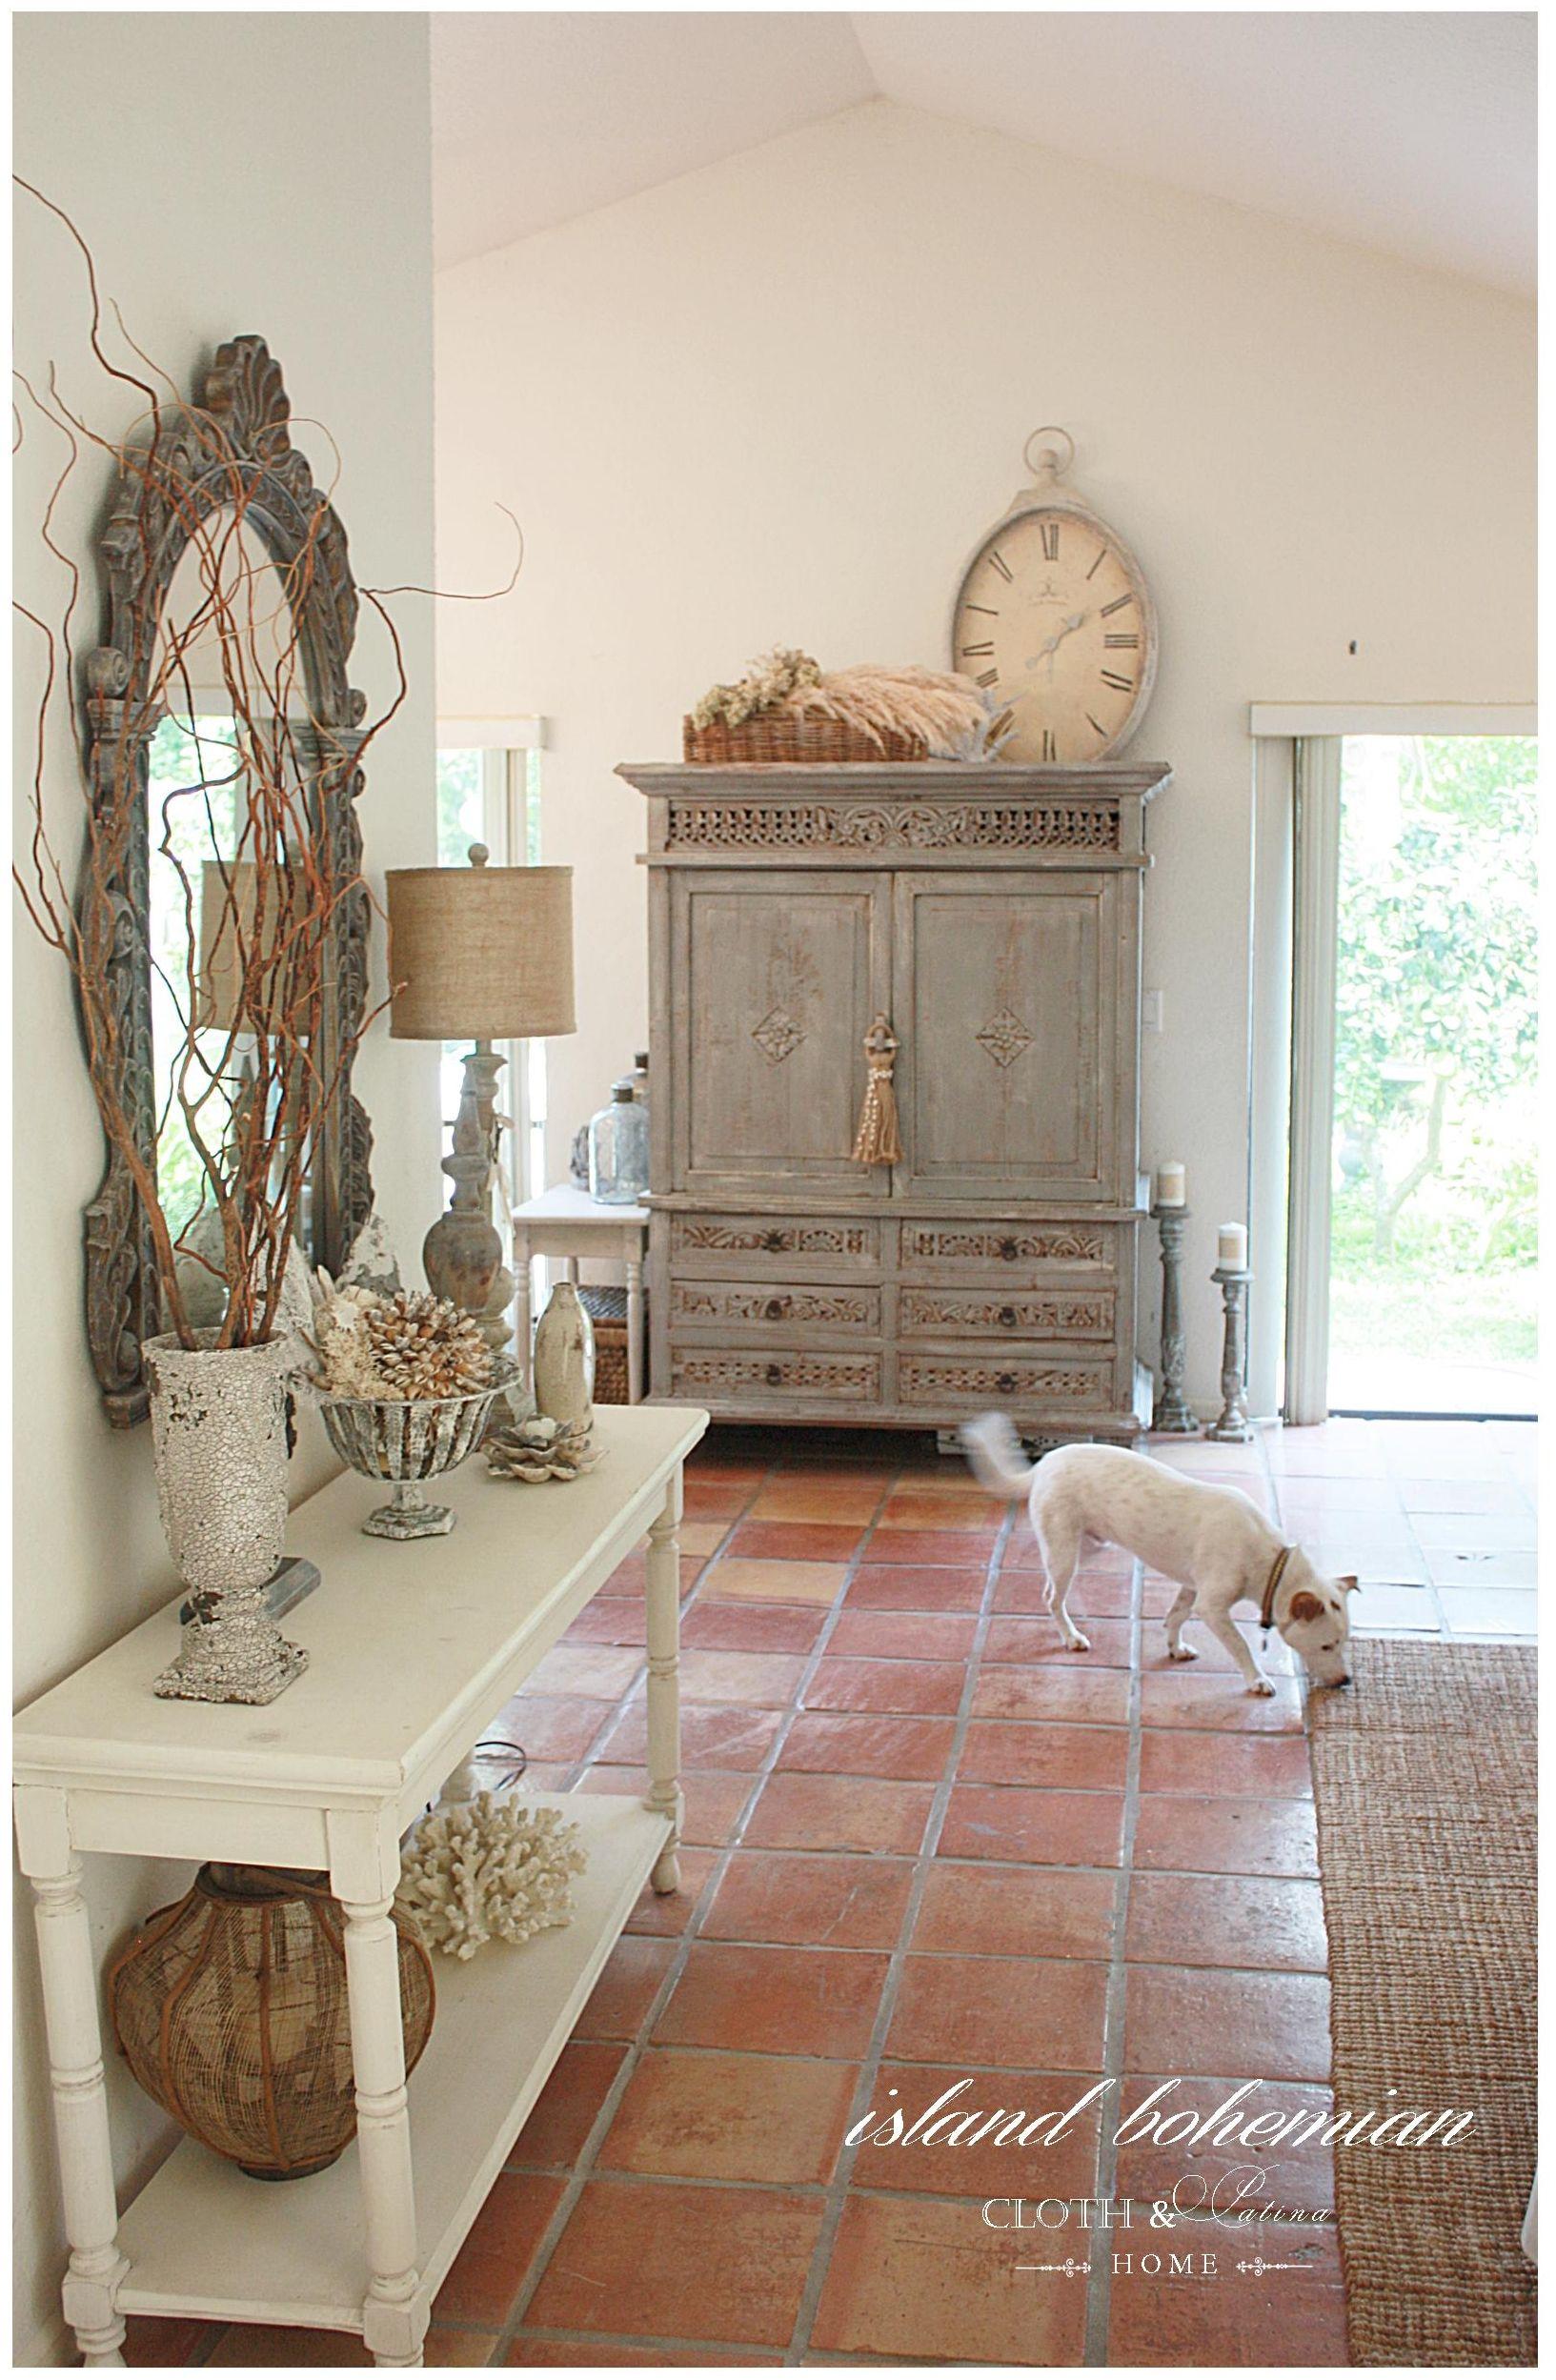 cloth and patina island boho decor13a | Decoracion | Pinterest ...